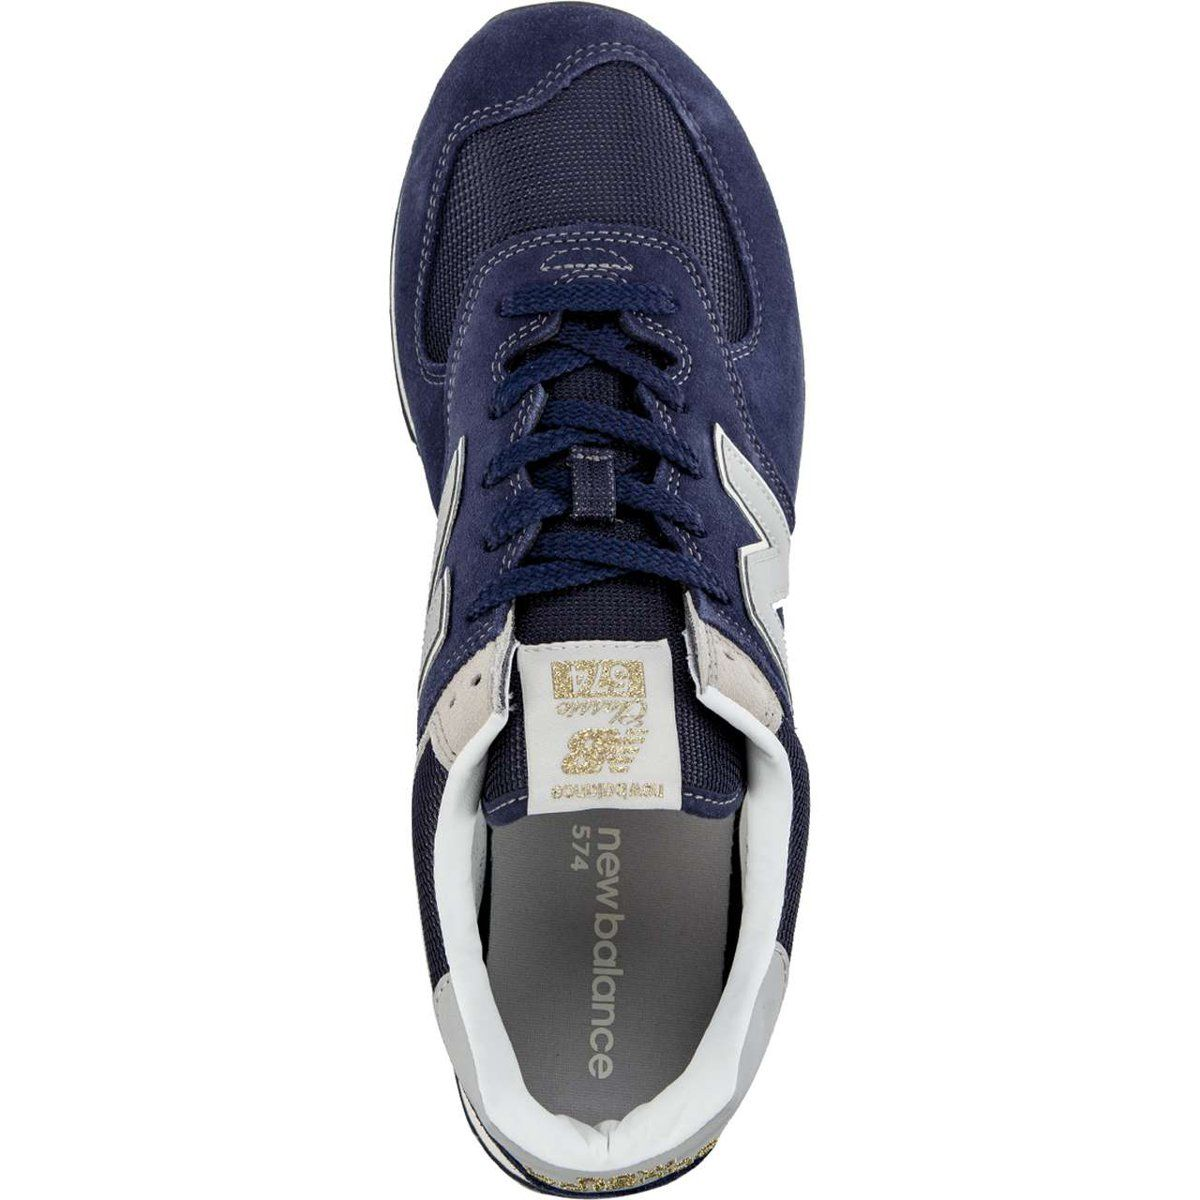 Sportowe Meskie Newbalance New Balance Niebieskie Ml574vla Navy Vans Sneaker Vans Authentic Sneaker New Balance